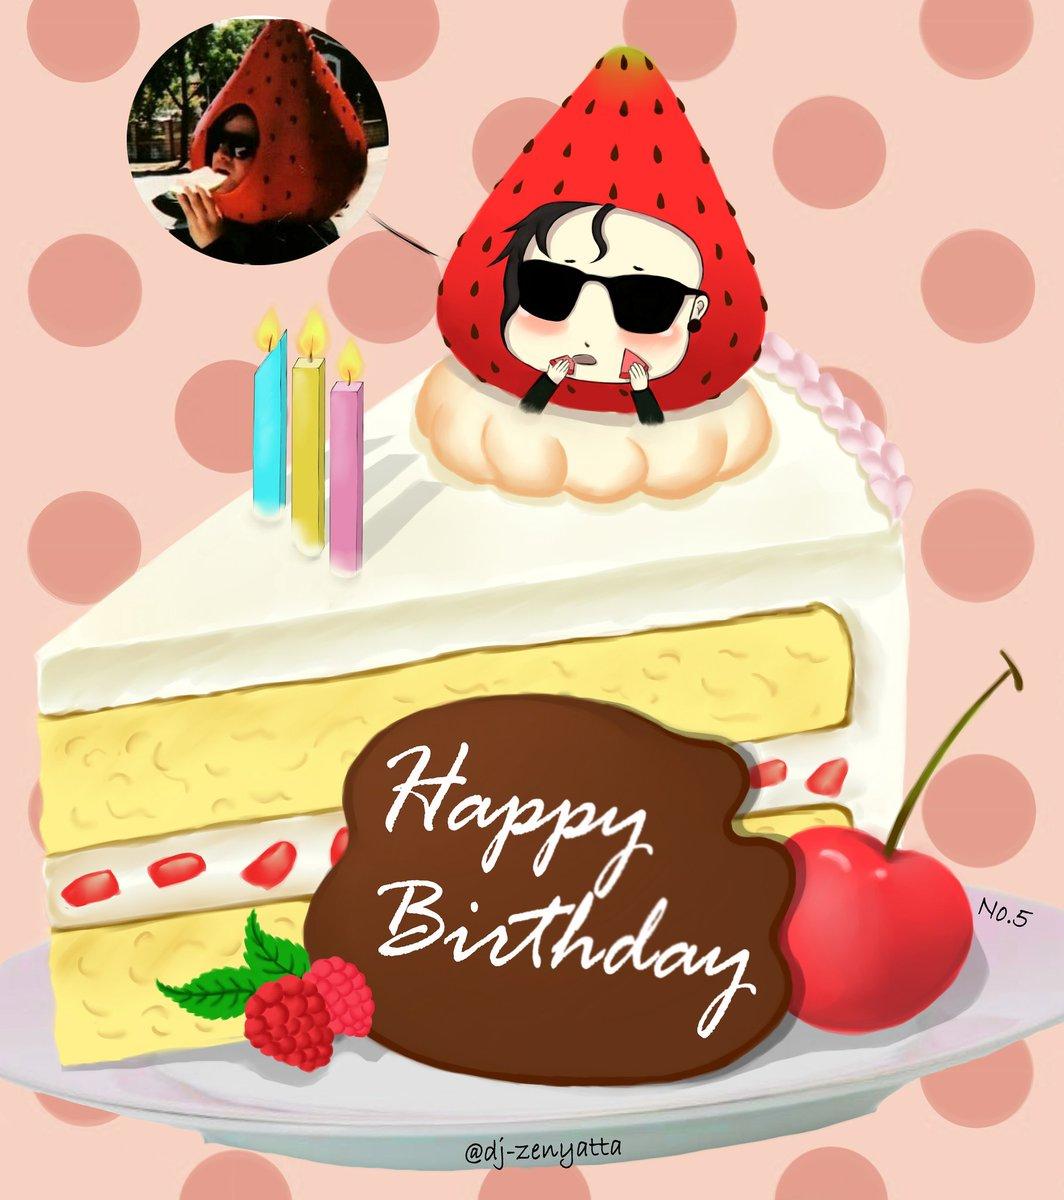 Dj Zenyatta On Twitter Sorry I Am Late In Twitter Happy Birthday